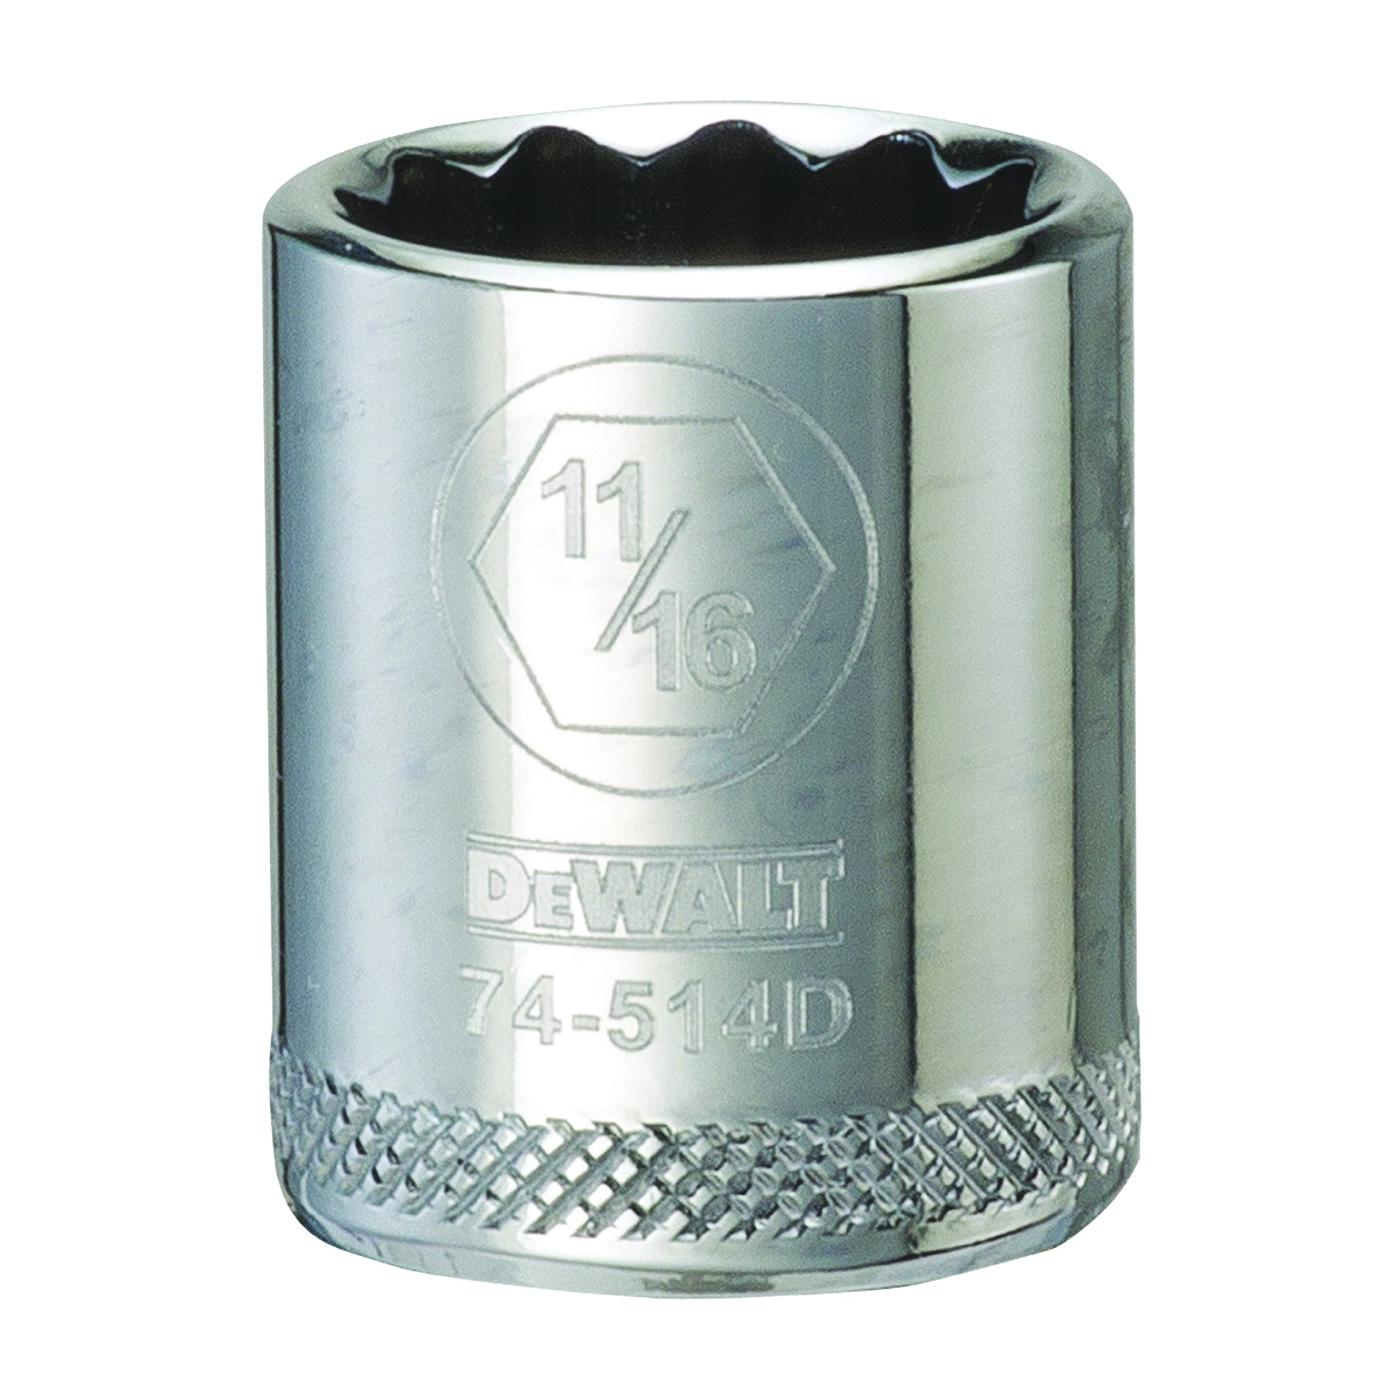 Picture of DeWALT DWMT74514OSP Hand Socket, 11/16 in Socket, 3/8 in Drive, 12 -Point, Vanadium Steel, Polished Chrome